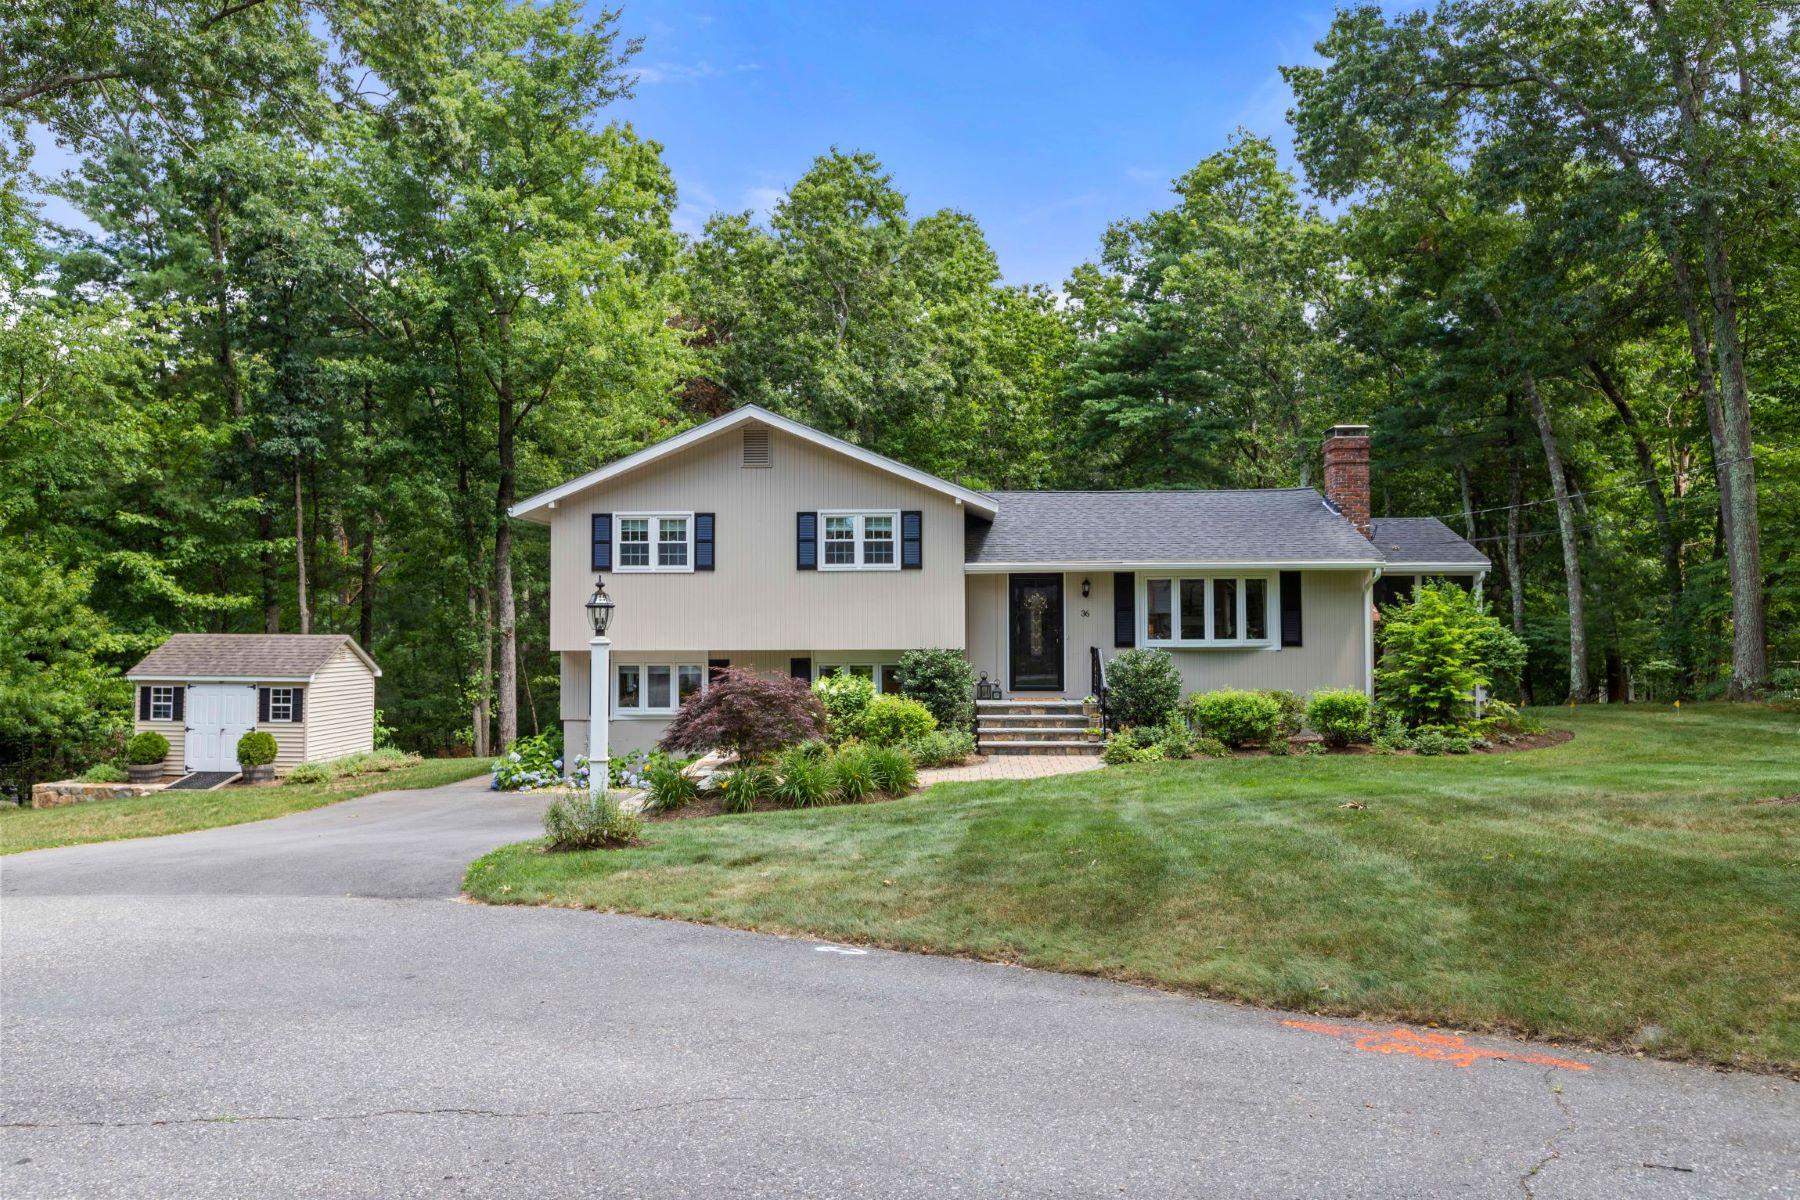 Single Family Homes 为 销售 在 36 Kendall Road 36 Kendall Rd 萨德伯里, 马萨诸塞州 01776 美国